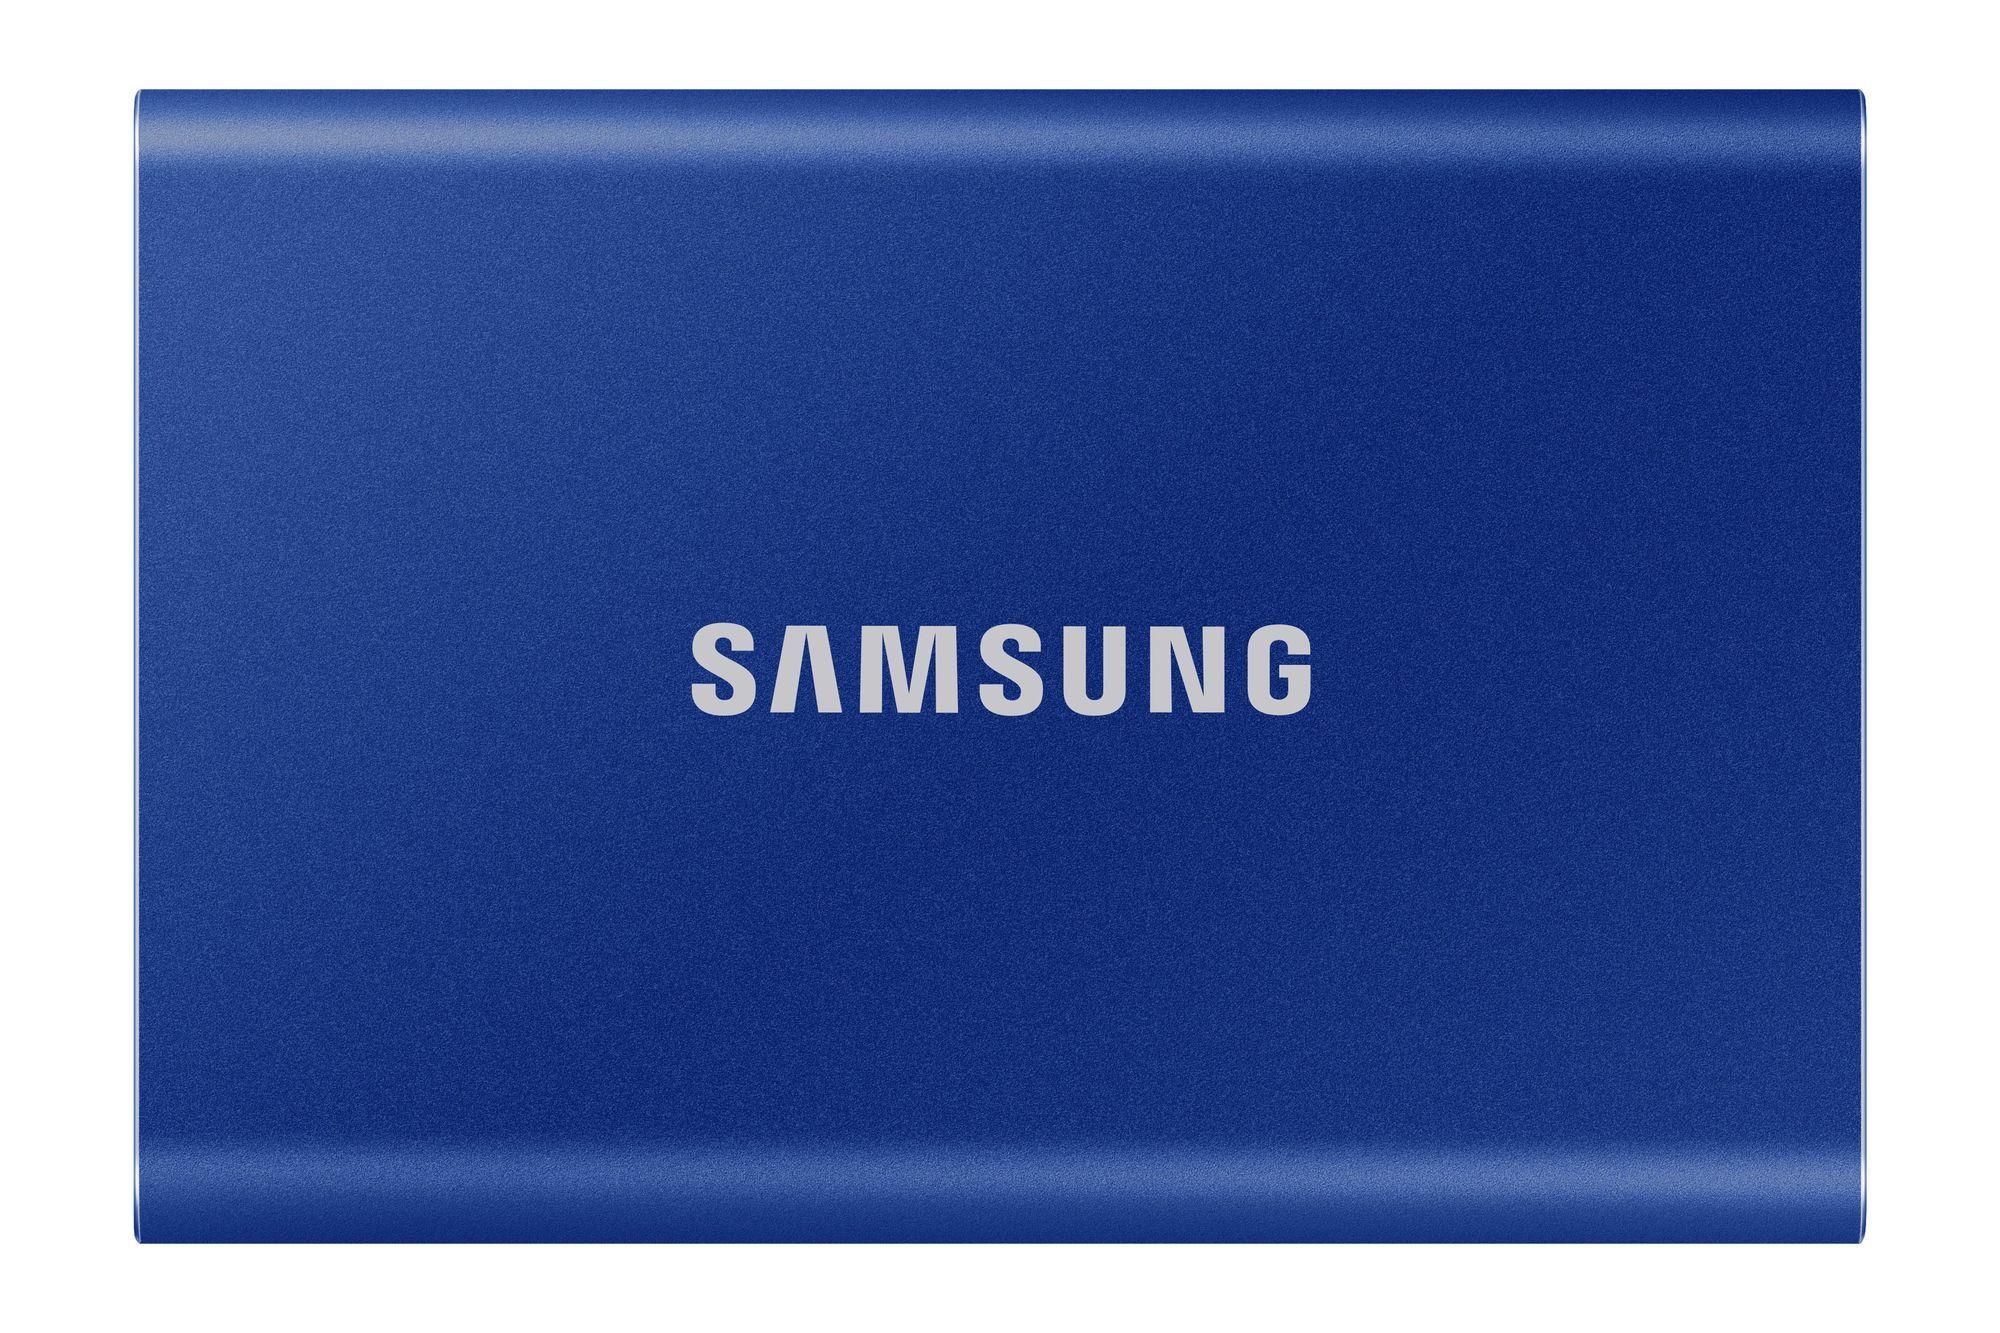 T7 Bleu indigo - 1 To - USB 3.2 Gen 2